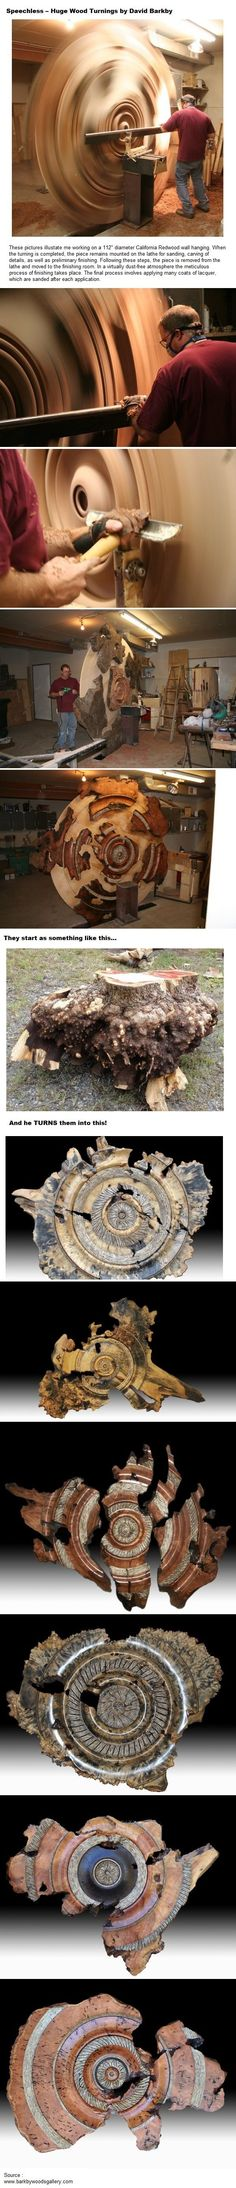 Speechless ..Huge Wood Turnings by David Barkby: